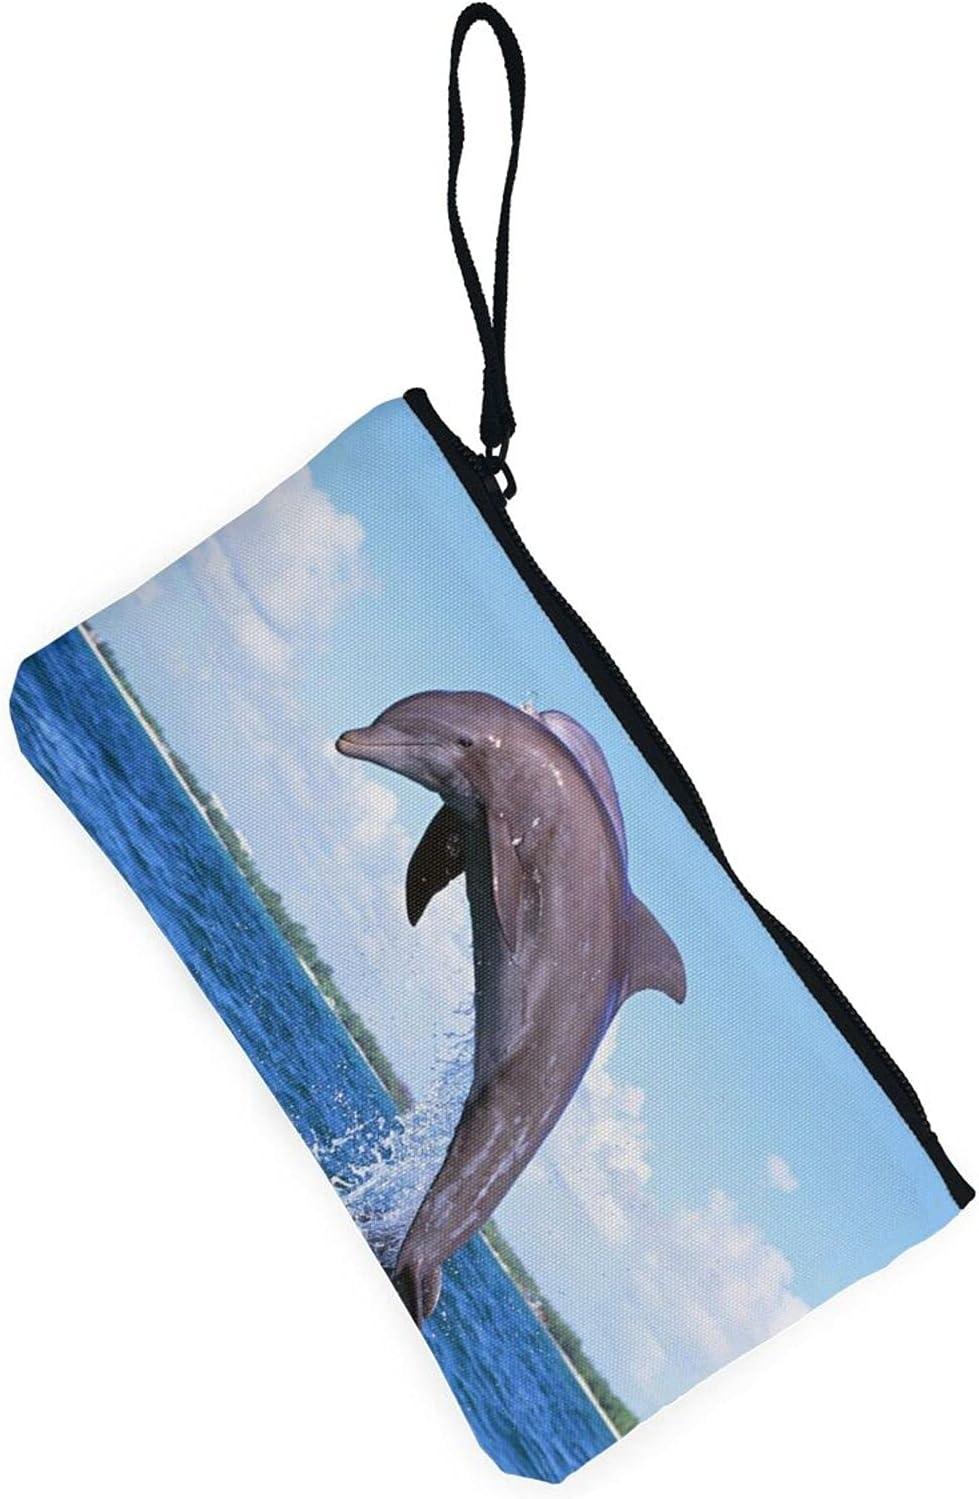 AORRUAM Cute Dolphin Canvas Coin Purse,Canvas Zipper Pencil Cases,Canvas Change Purse Pouch Mini Wallet Coin Bag